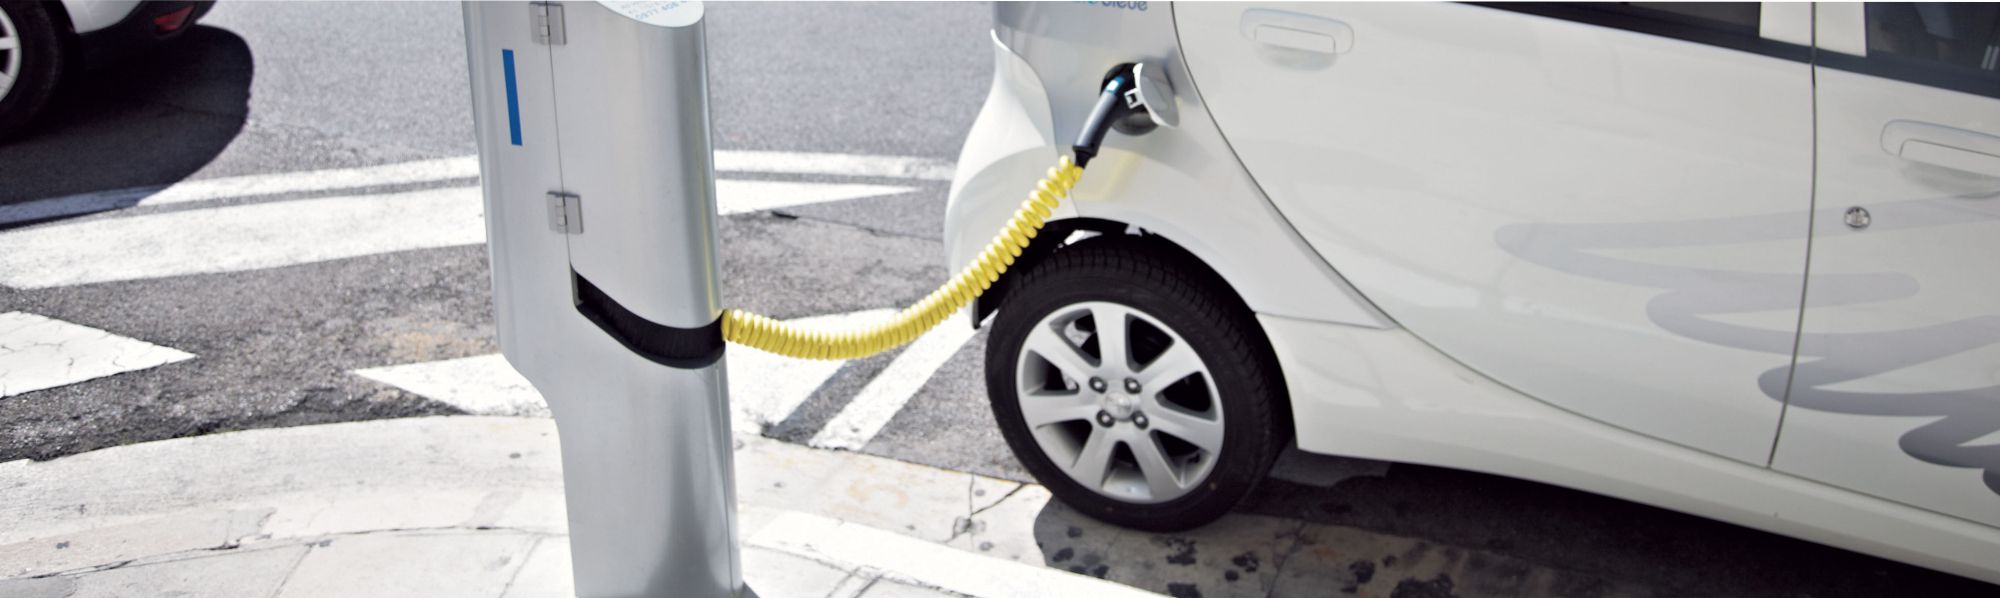 borne recharge ev ve véhicule electric prix installation